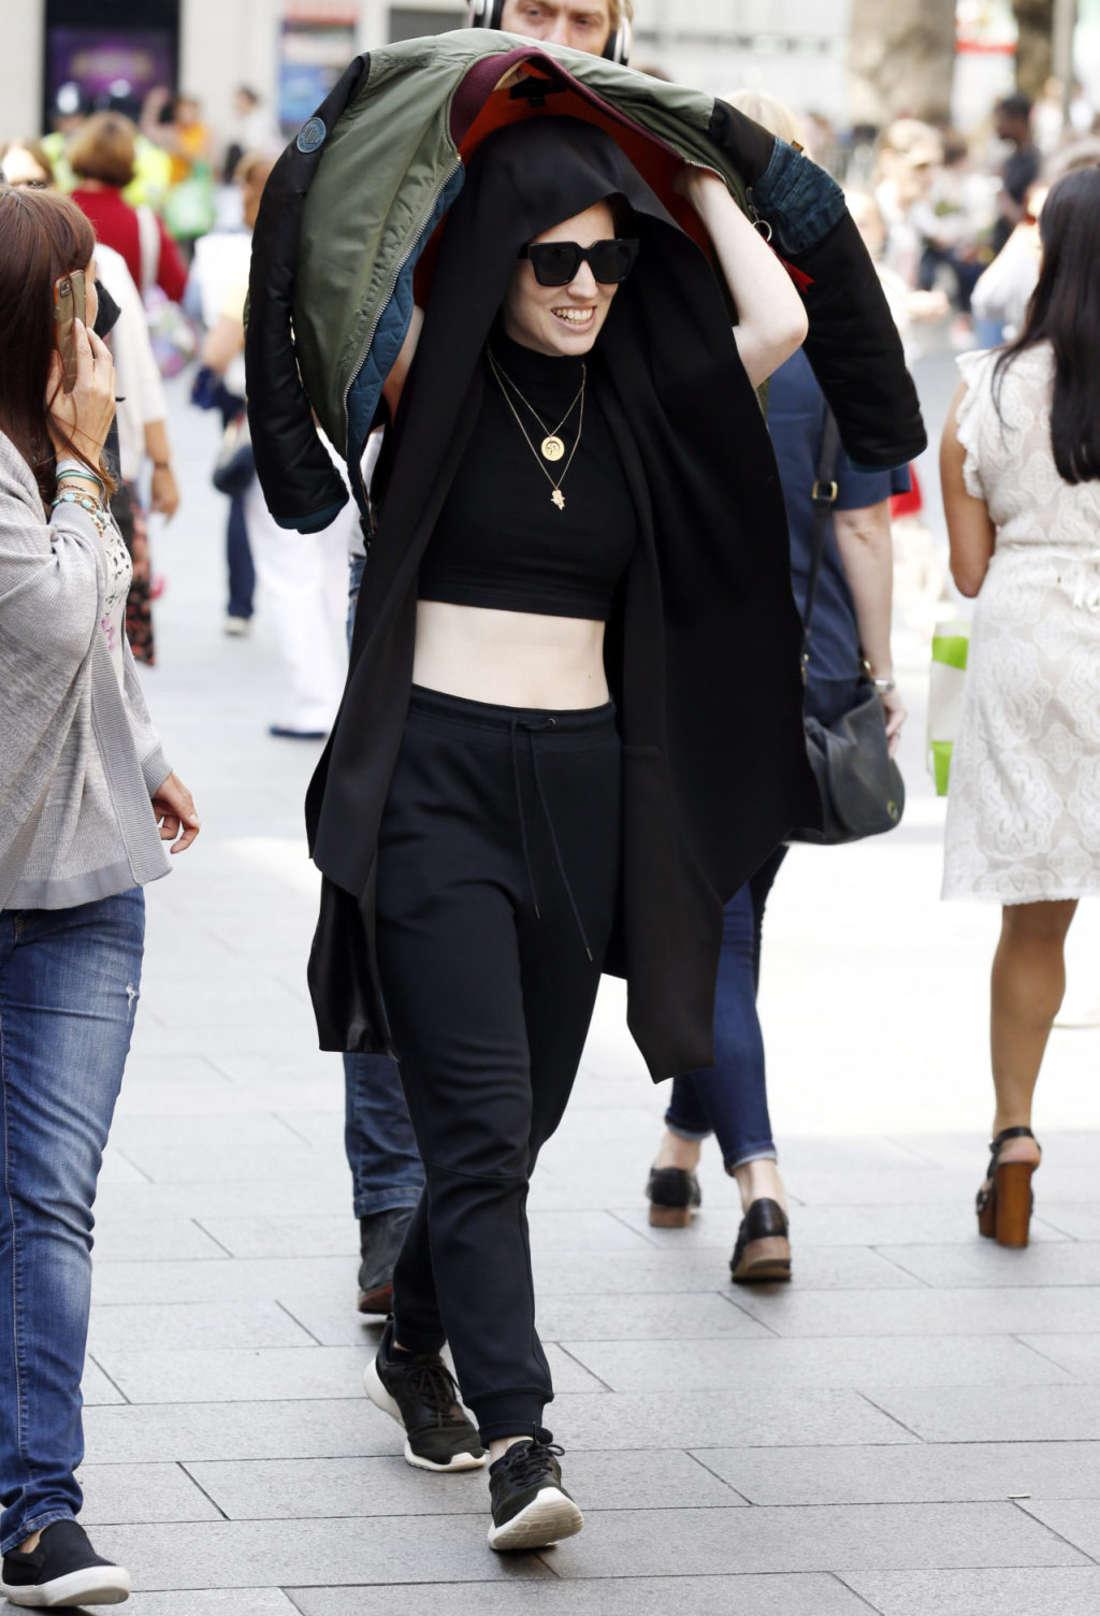 Jess Glynne Leaving the Global Radio Studios